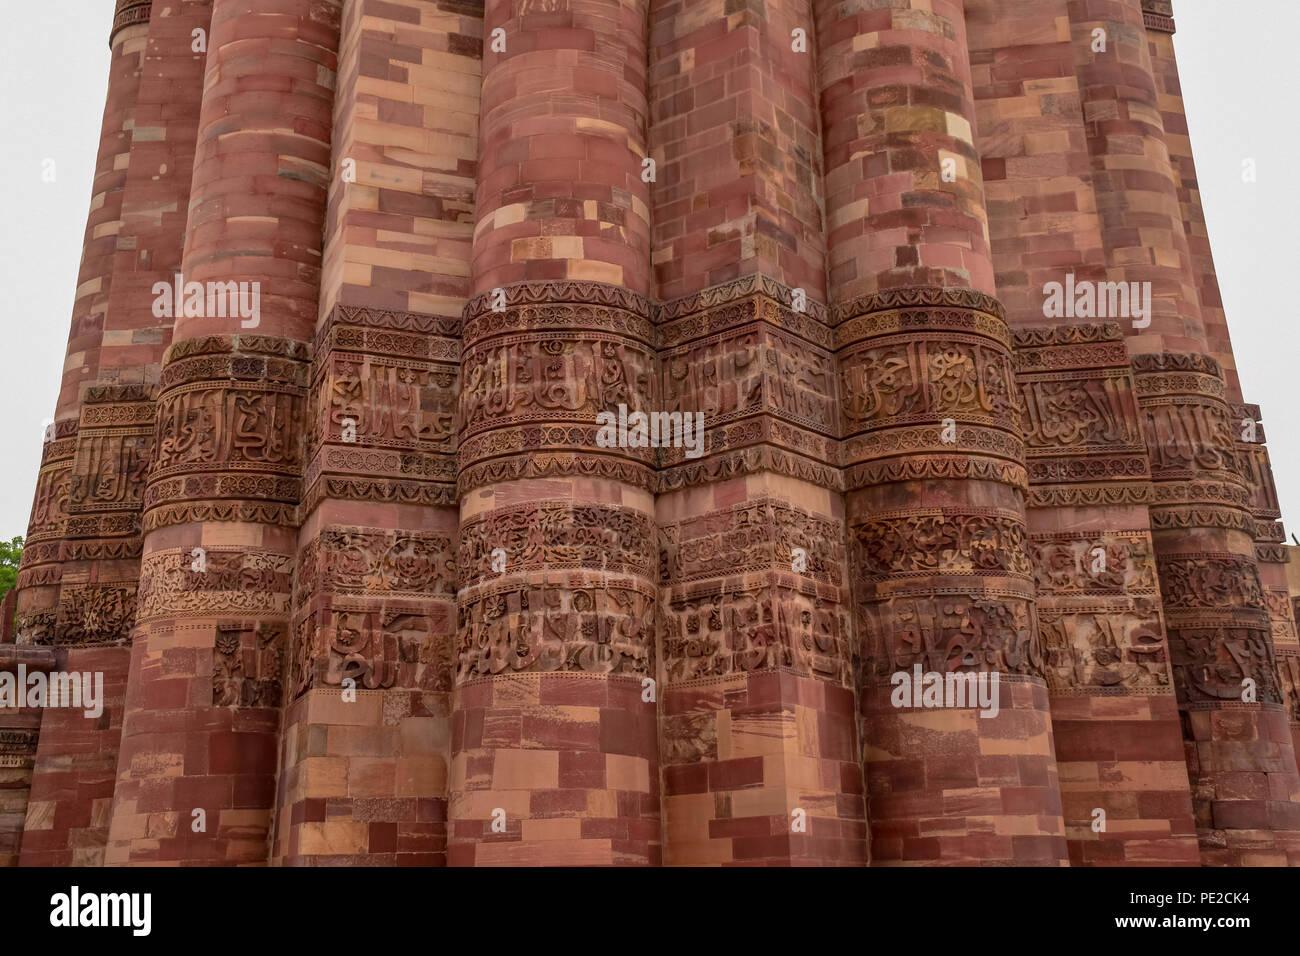 24bfcde831ee Qutb Minar built in 1311 red sandstone tower   Indo Muslim art   Delhi  sultanate   Delhi   India UNESCO World Heritage Site. F3G6FP (RM). Delhi